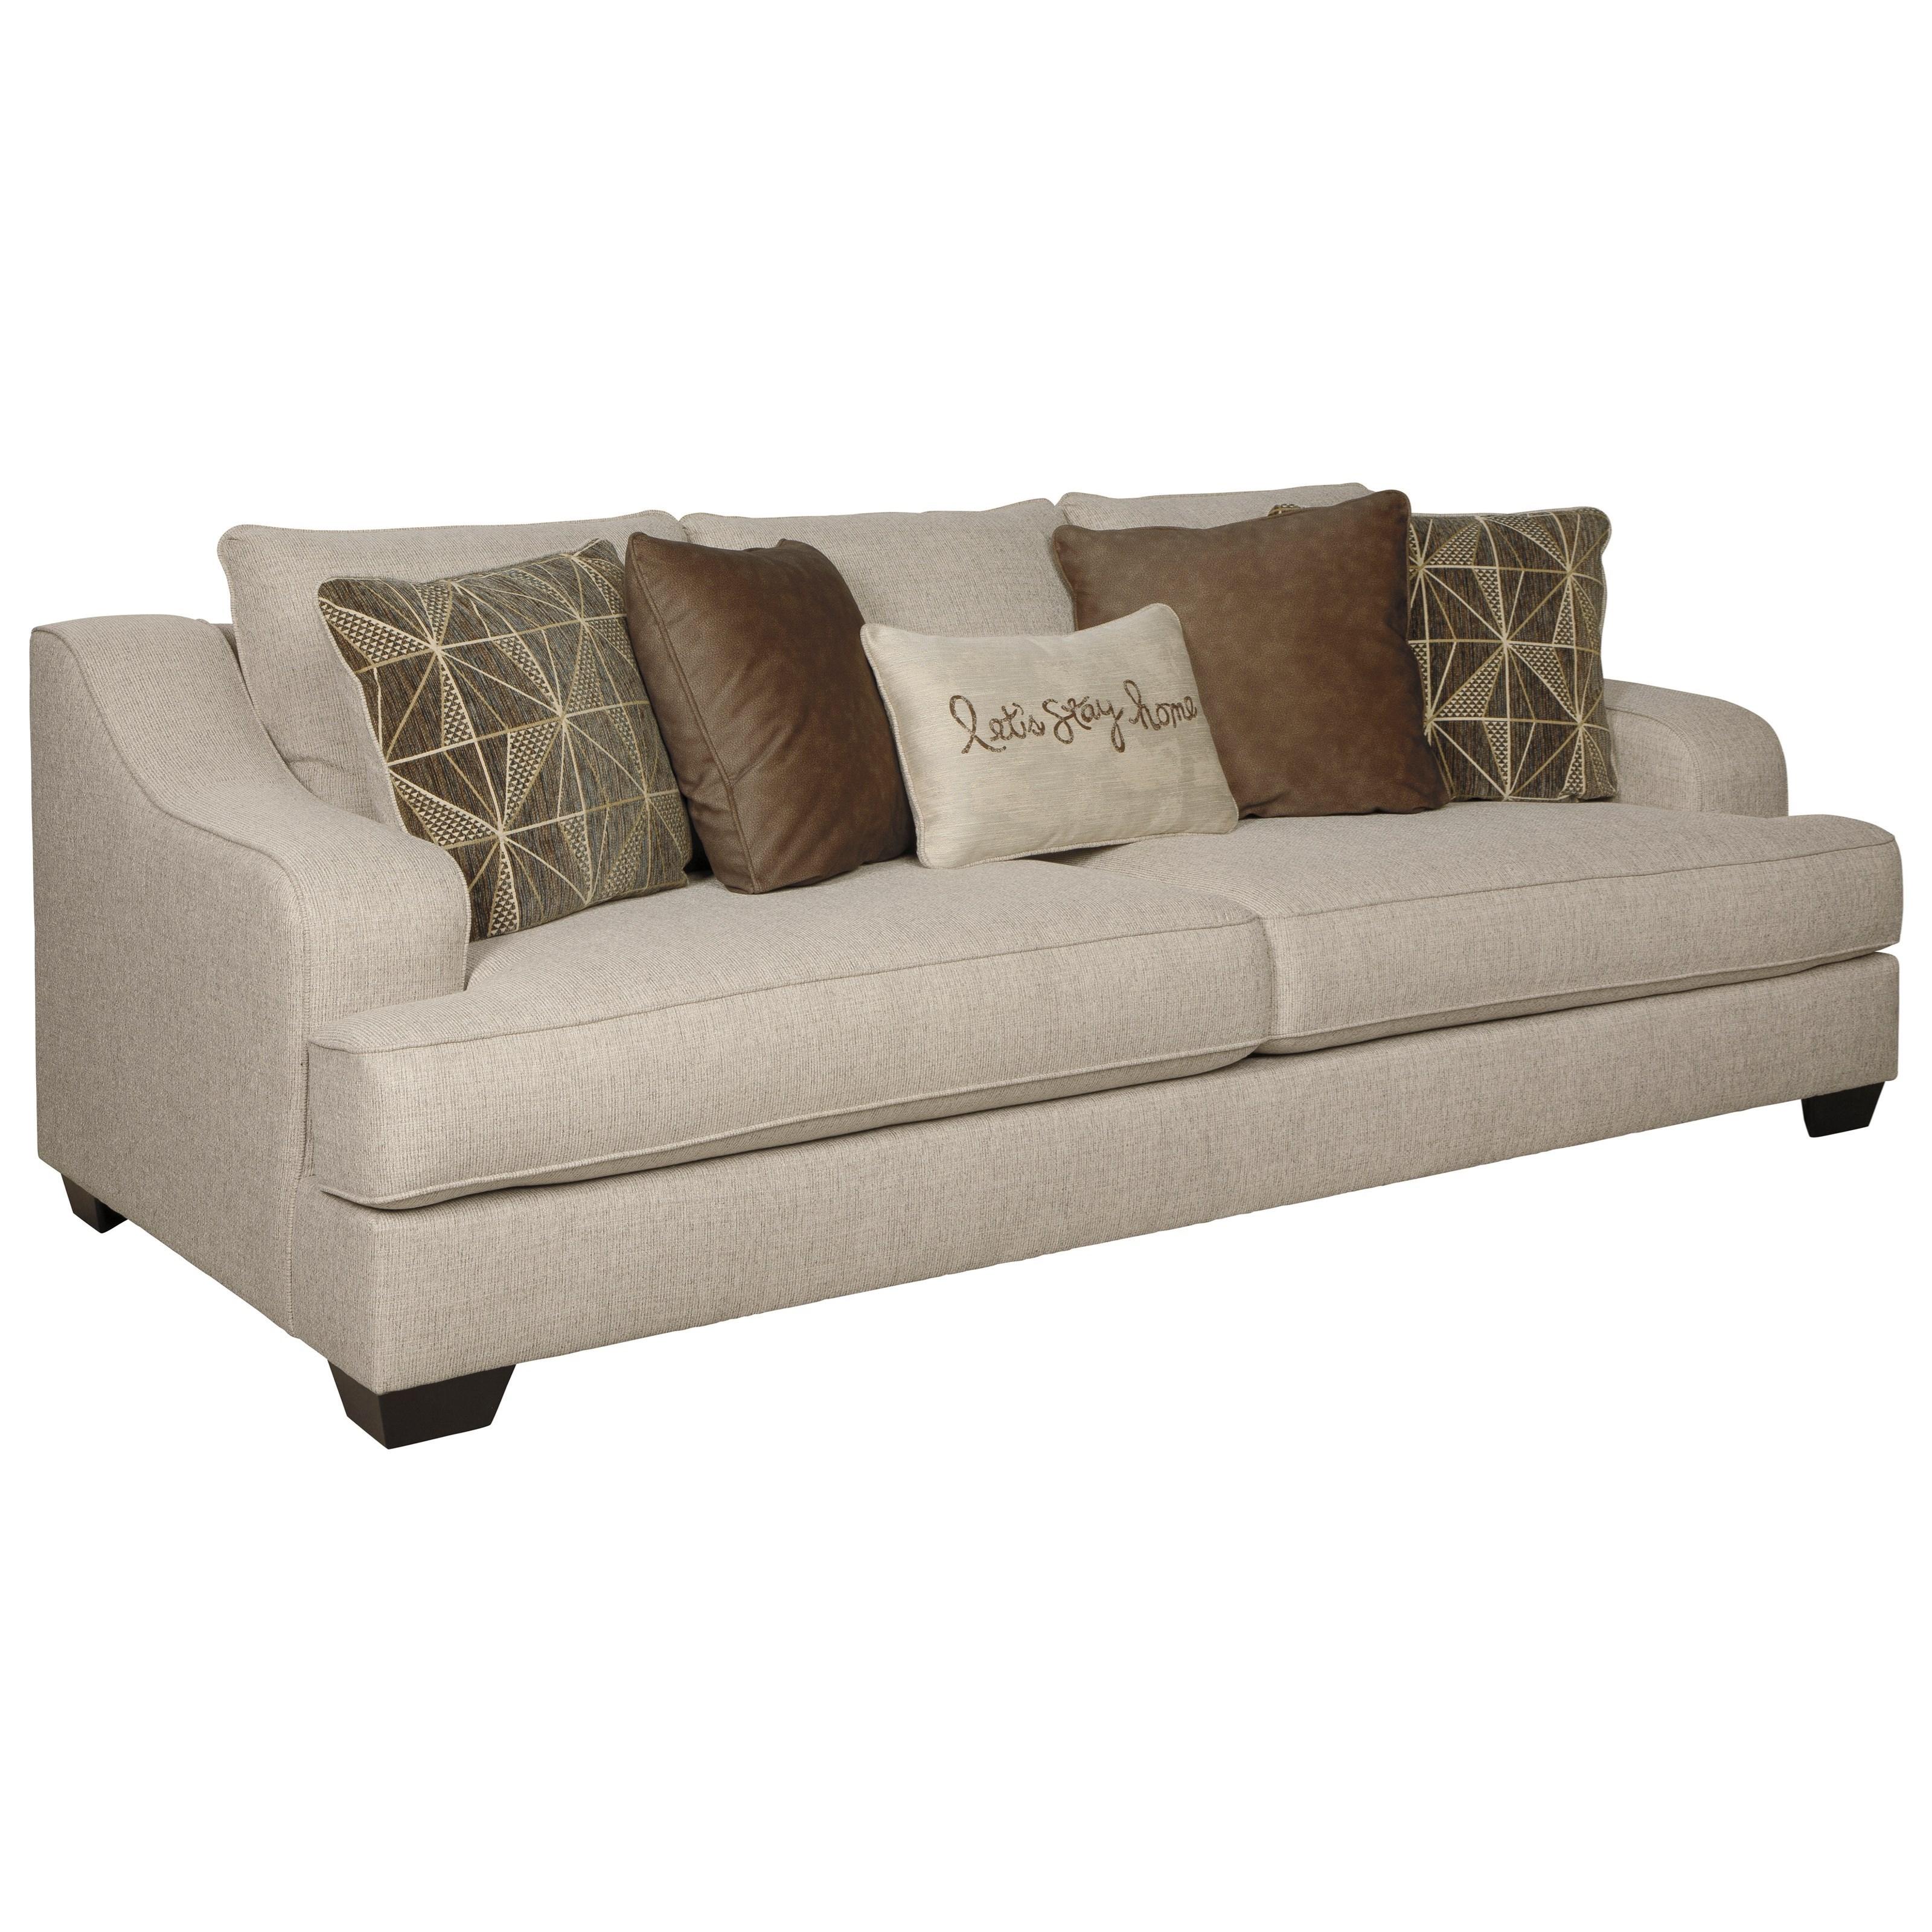 Benchcraft By Ashley Marciana Transitional Sofa Royal Furniture